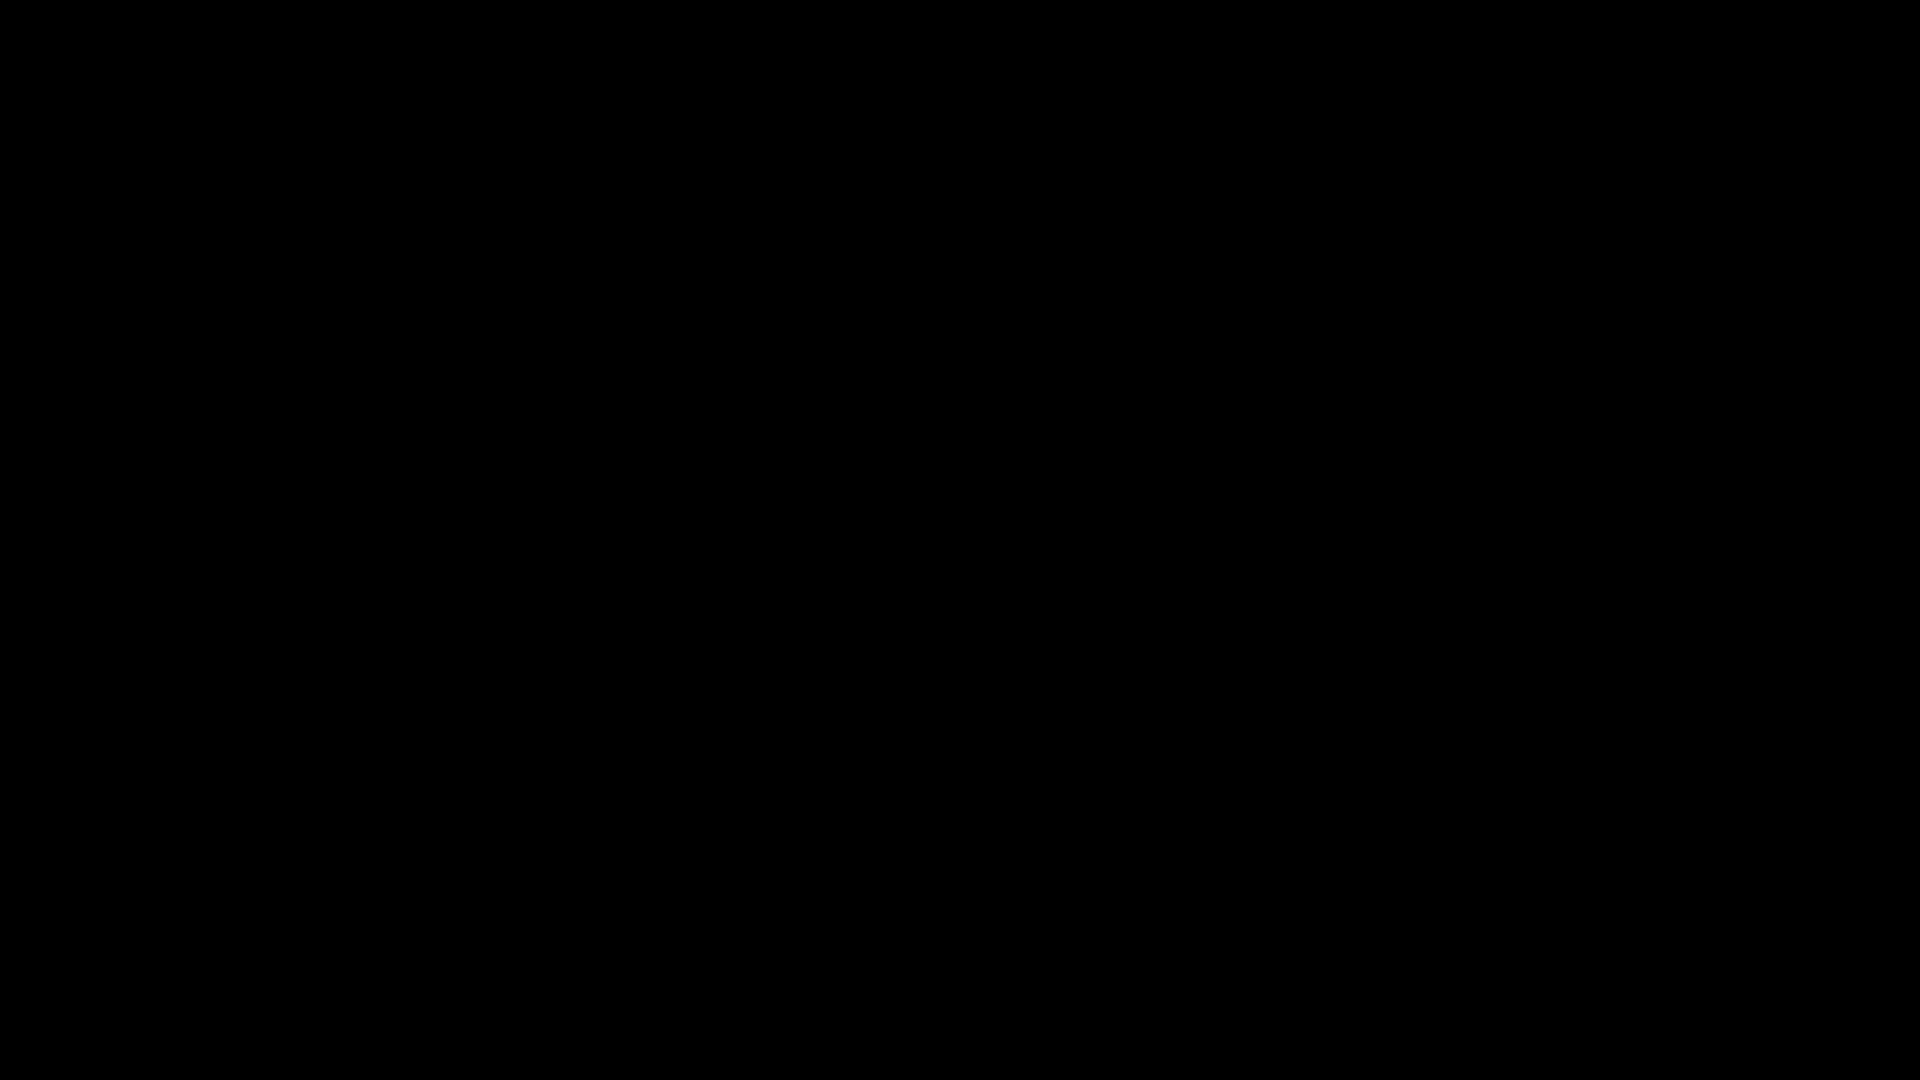 1920x1080-black-solid-color-background